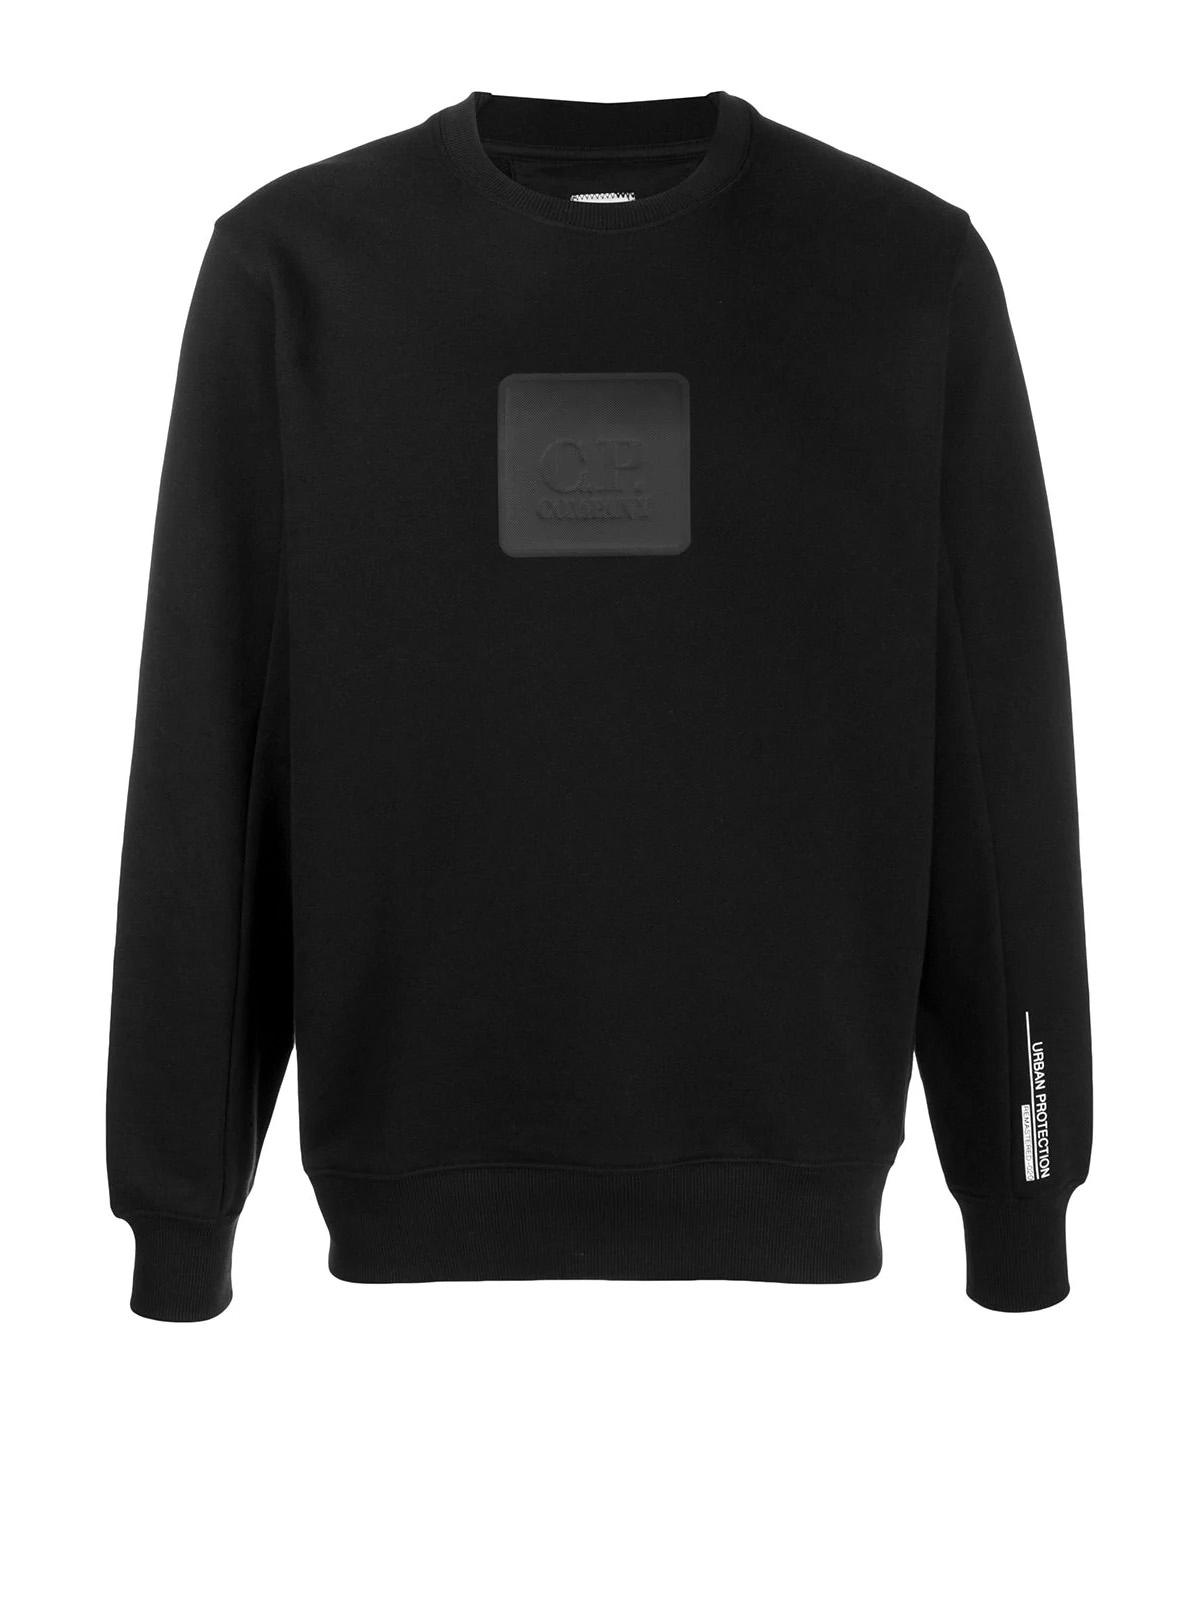 Diagonal Raised Fleece Urban Protection Series Logo Sweat C.P. COMPANY | Sweatshirt | 09CMSS171A005086W999